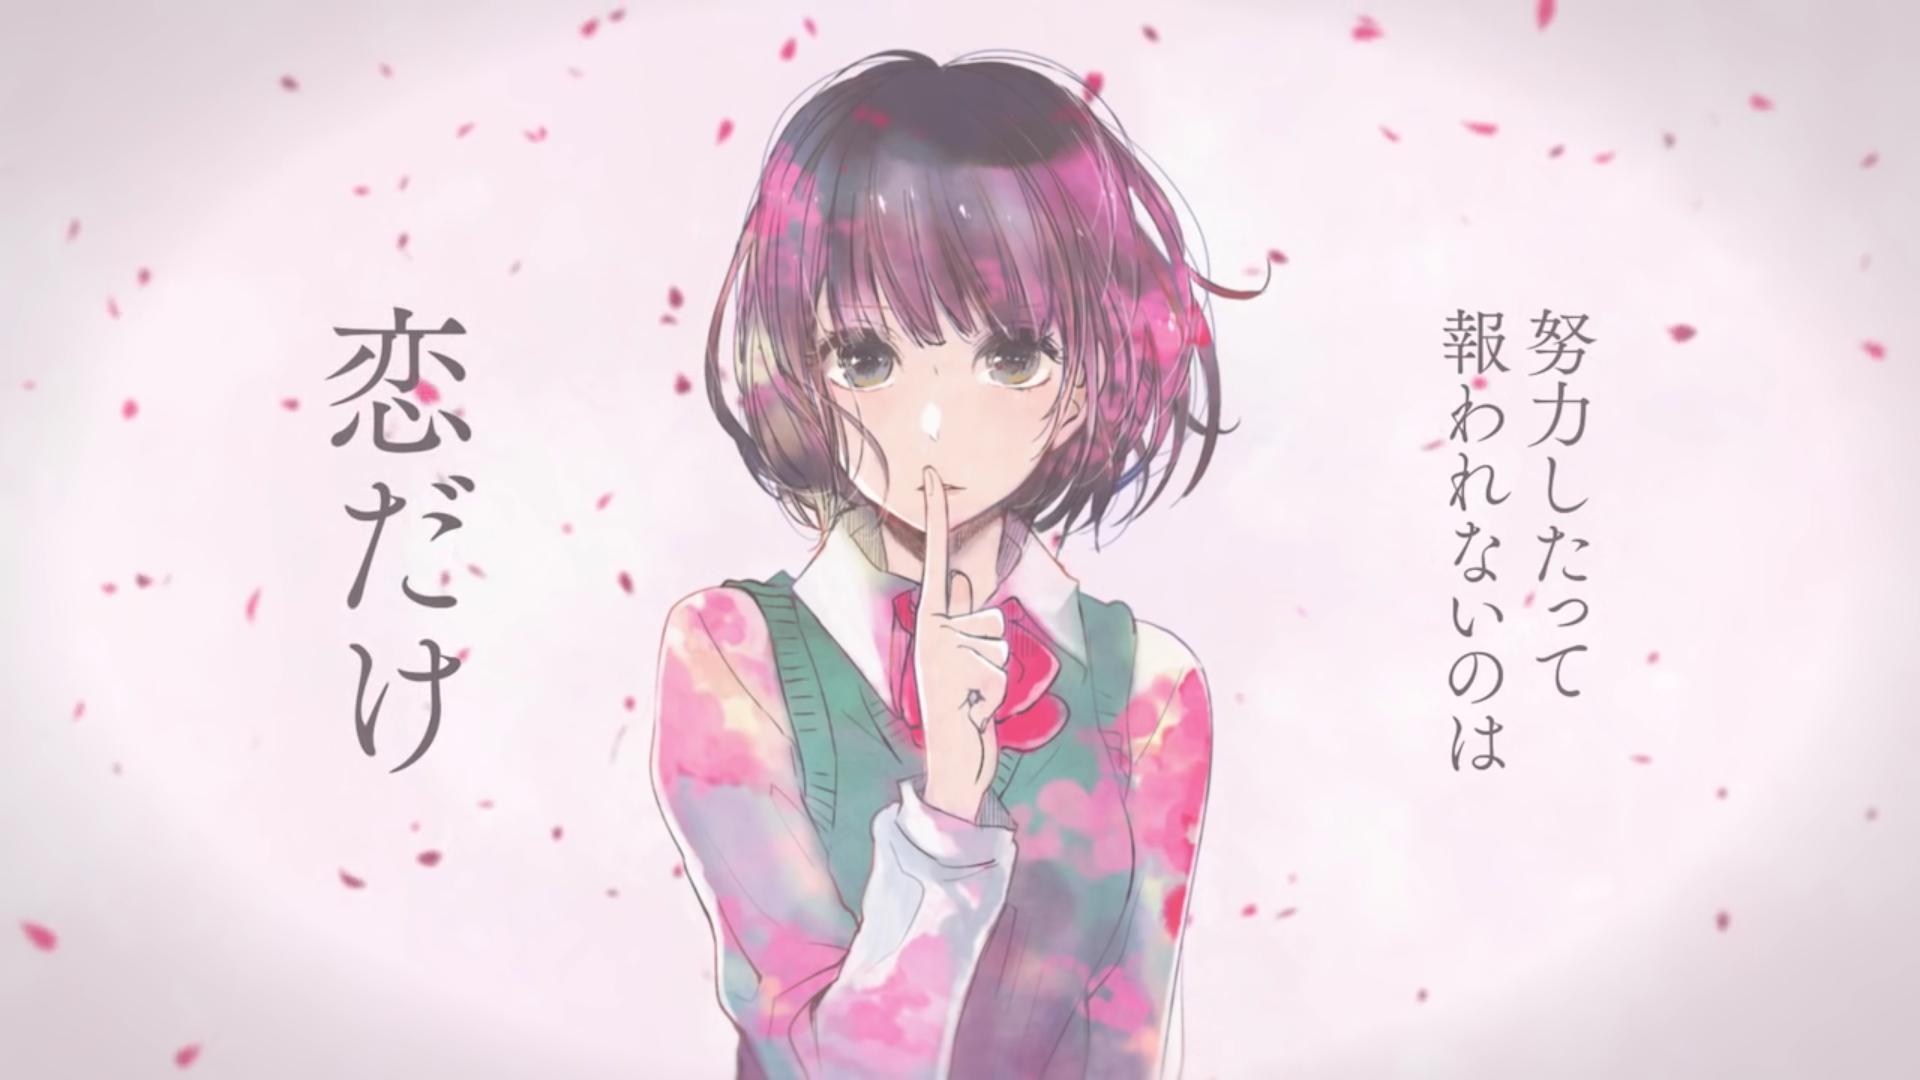 2Az4zYvDryNpw - [Aporte] Kuzu no Honkai [12/12][80MB][BD][H.264[10bit][Concluido]   - Anime Ligero [Descargas]